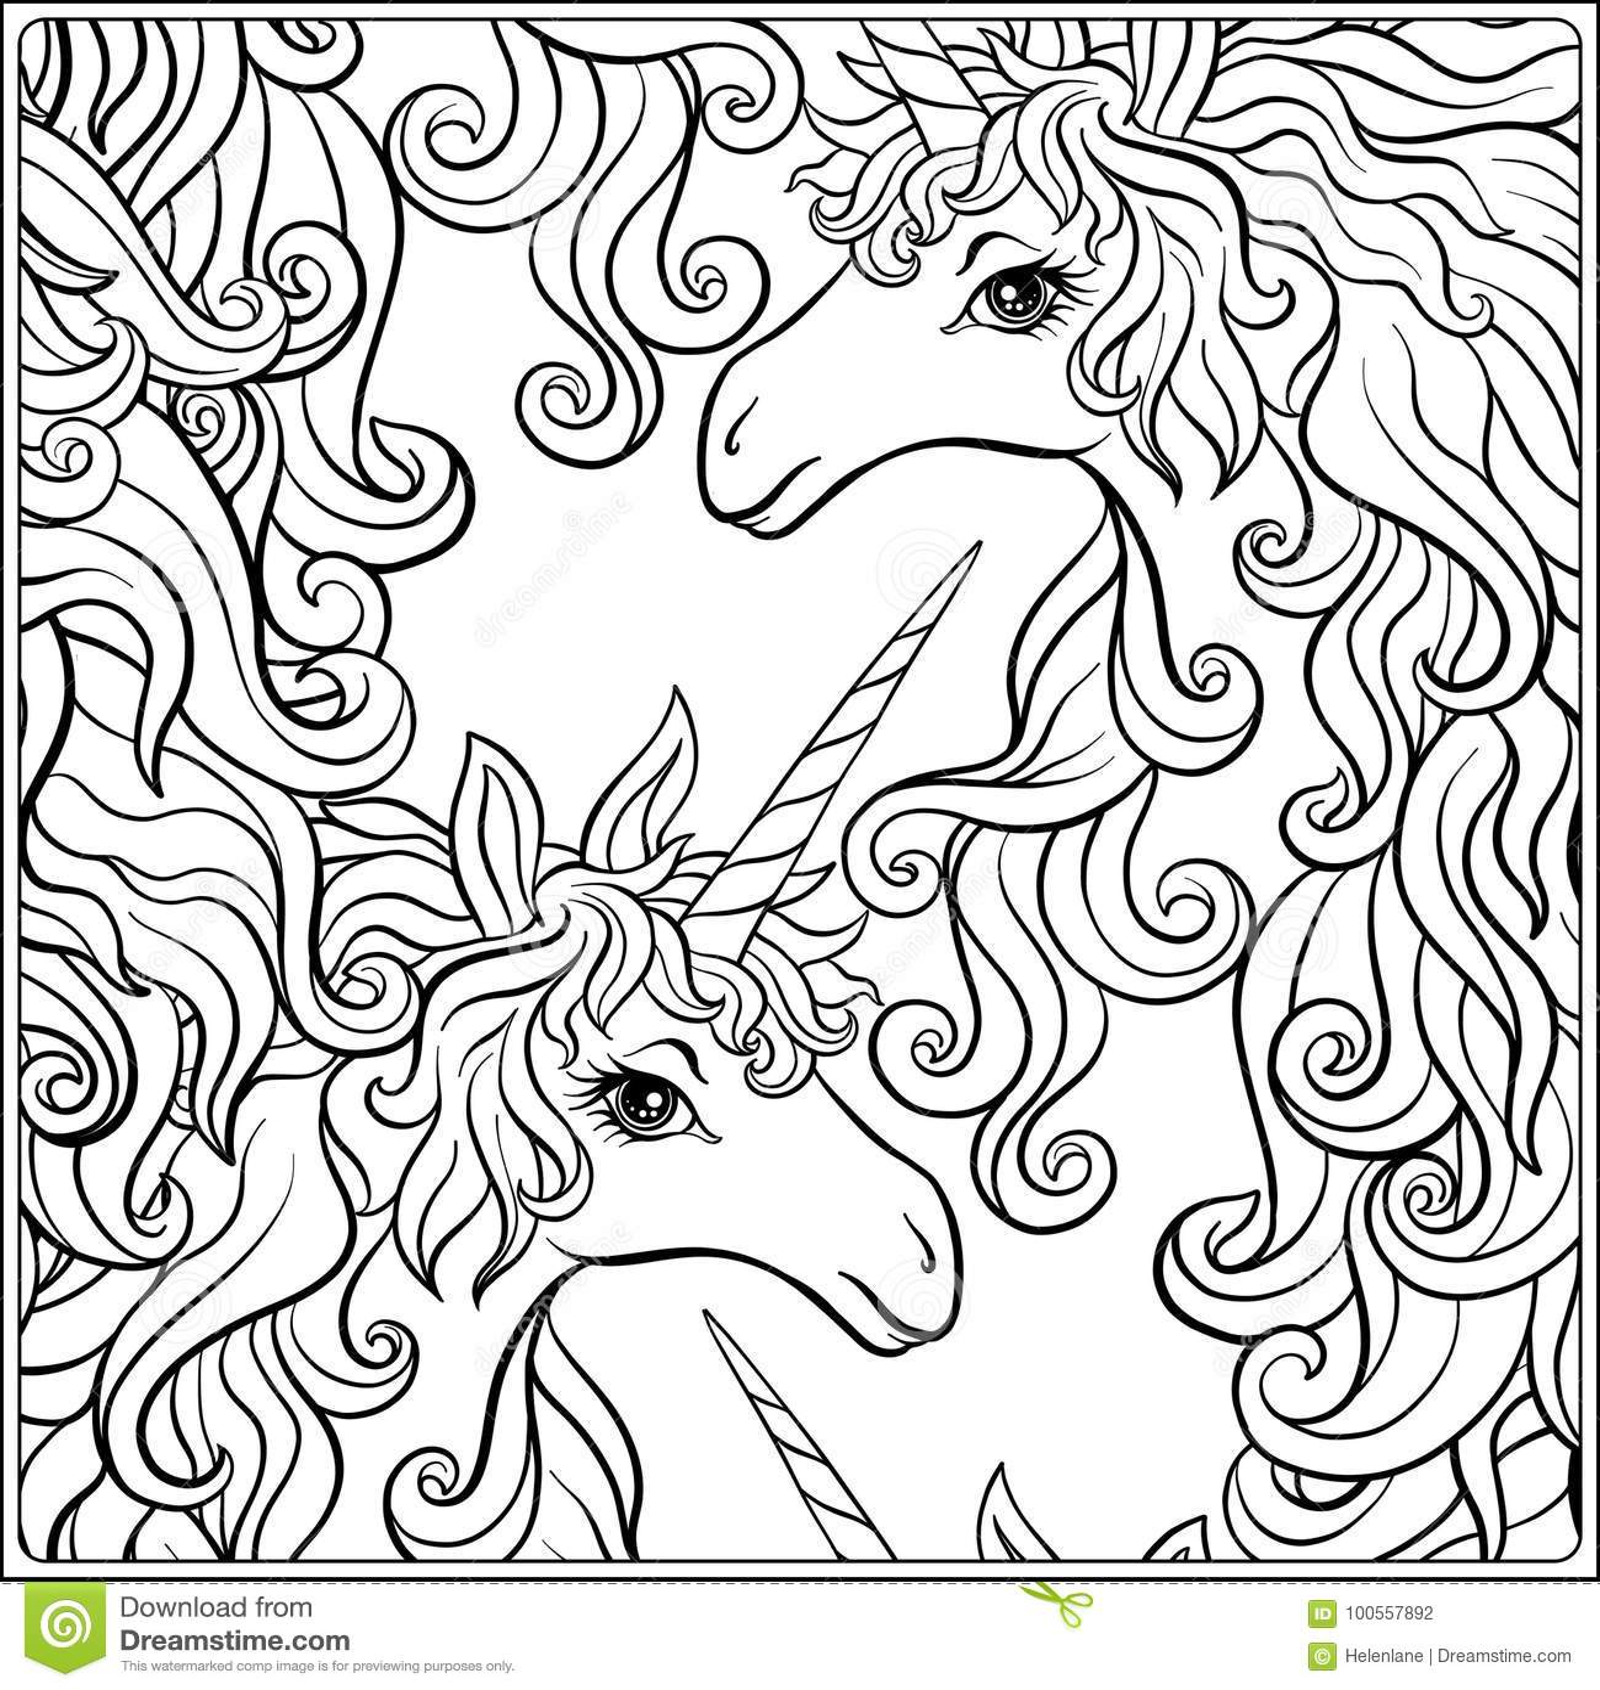 Unicorn La Composicion Consiste En Un Unicornio Rodeada Por Un Ramo